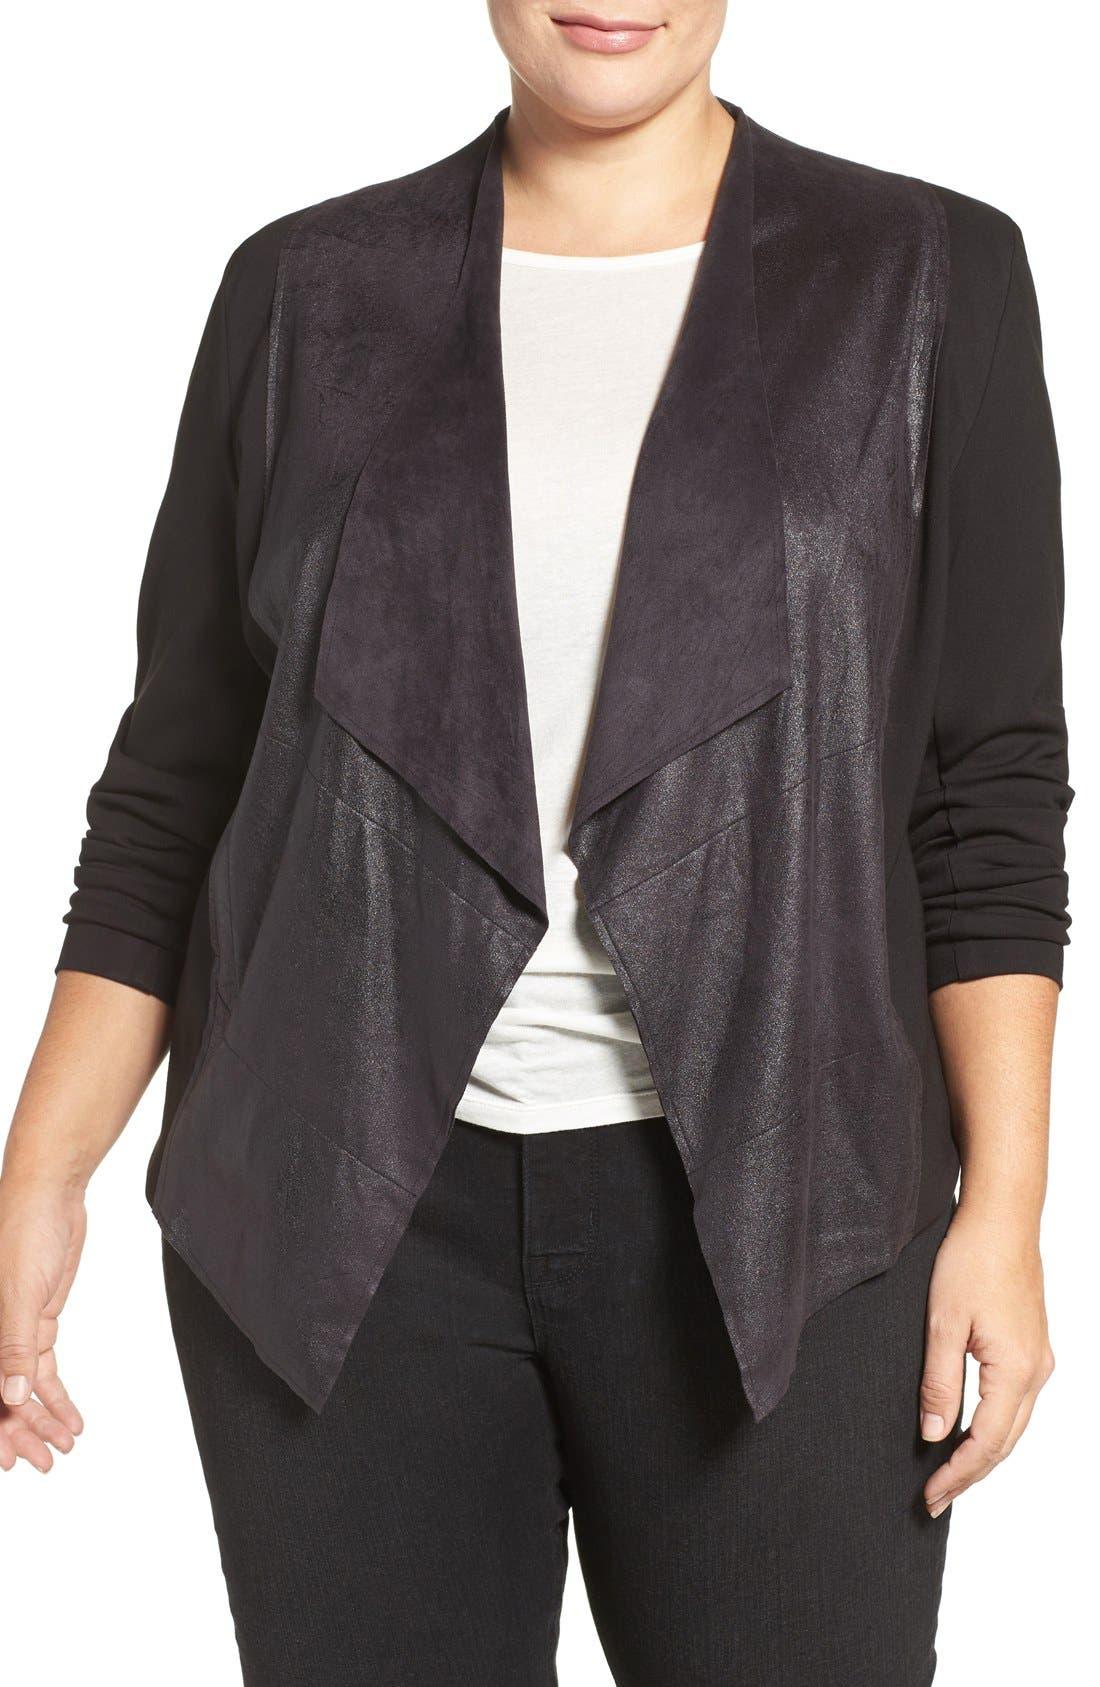 Tart 'Shanan' Faux Leather & Knit Drape Front Jacket (Plus Size)